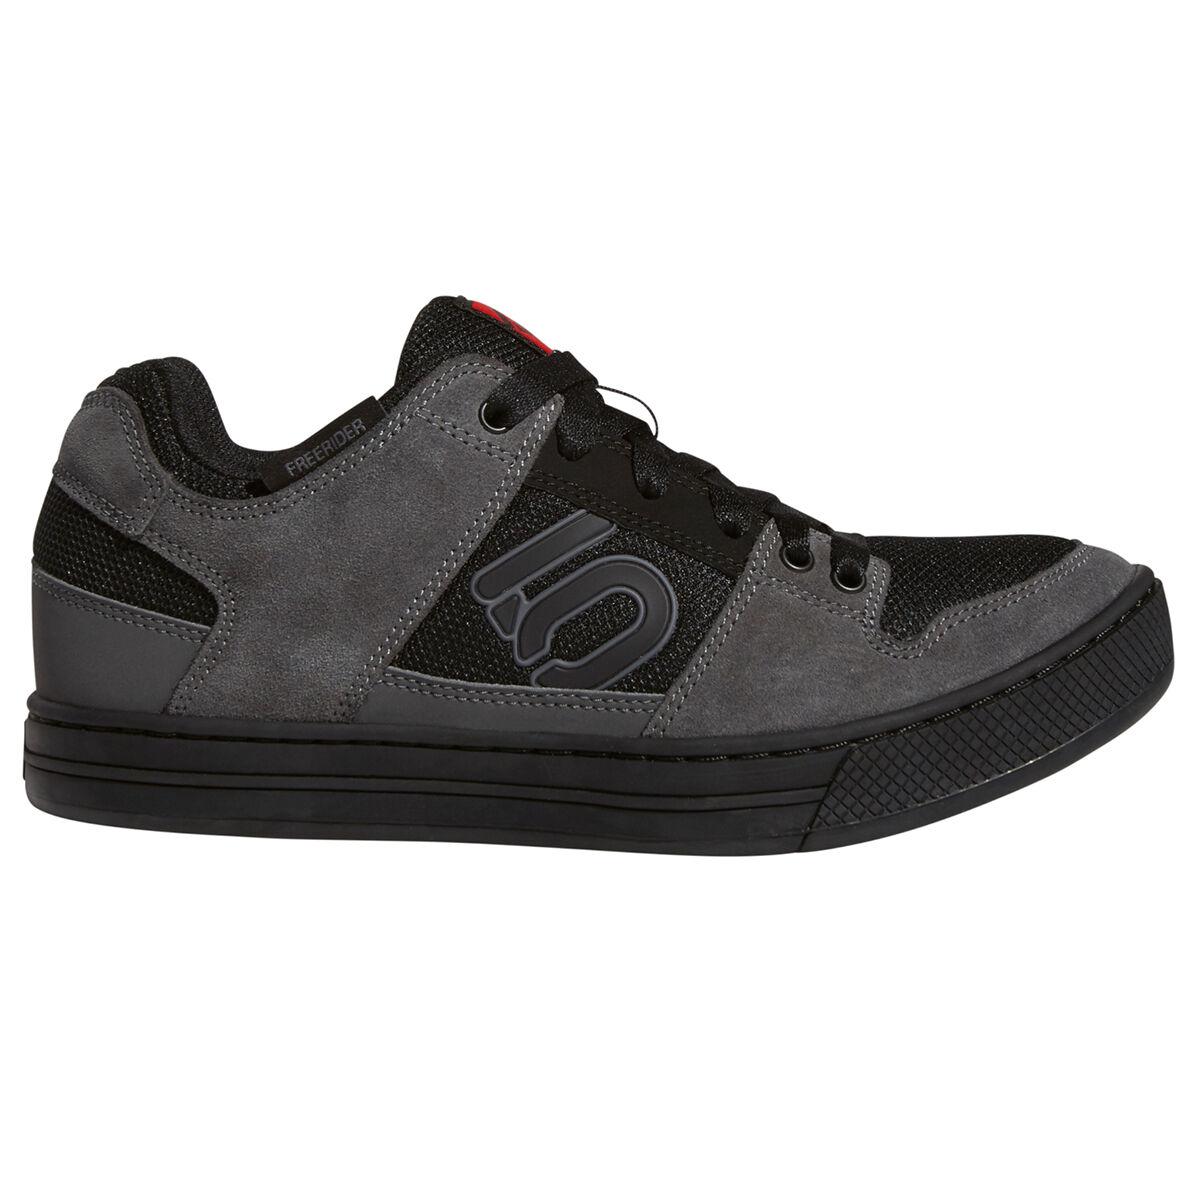 FIVE.TEN Five. ten Men's Freerider Mountain Bike Shoes - Size 12